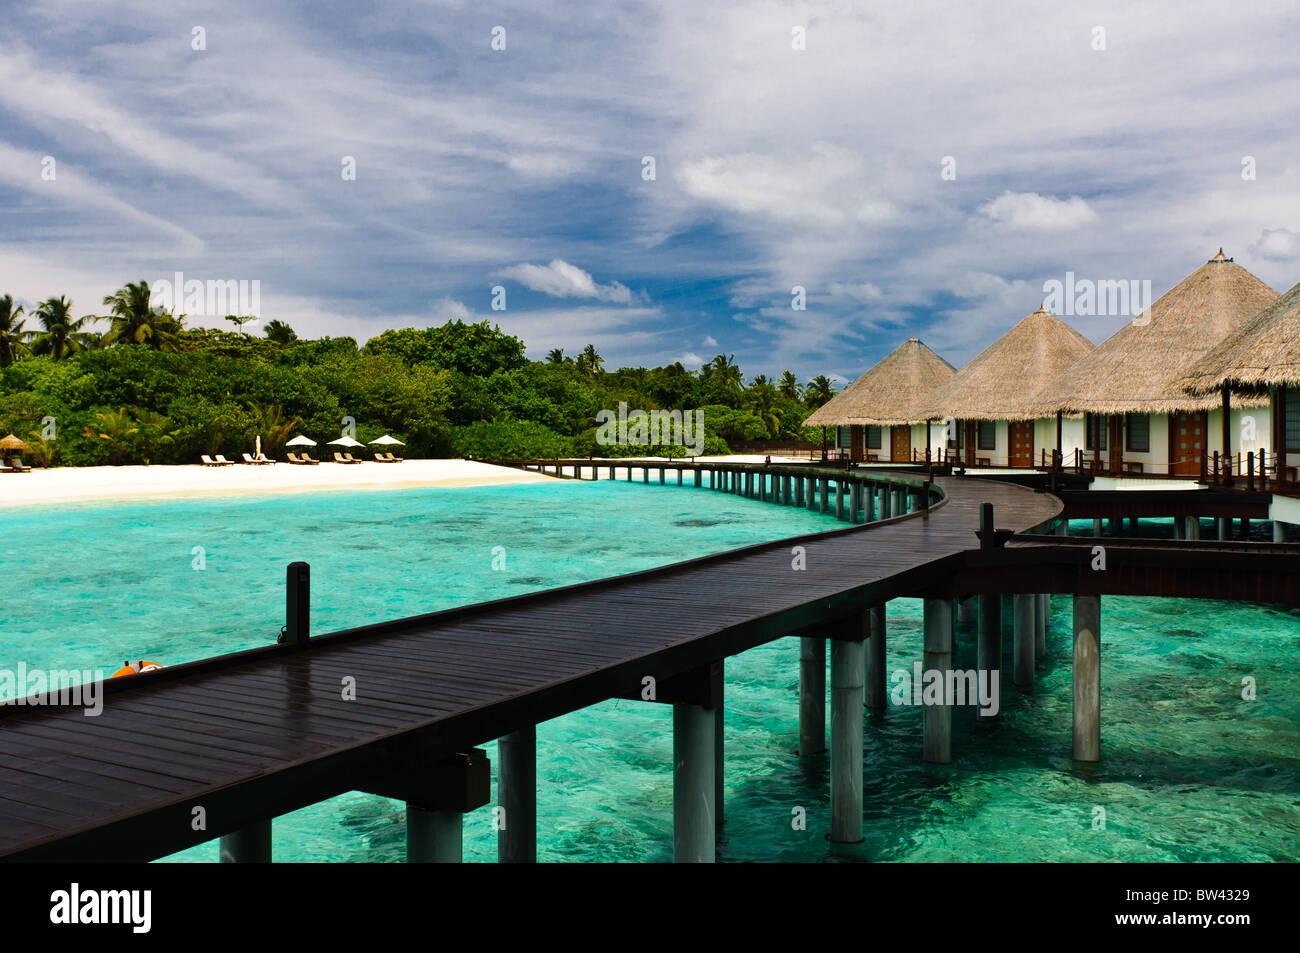 water bungalow turquoise ocean water stockfotos water. Black Bedroom Furniture Sets. Home Design Ideas